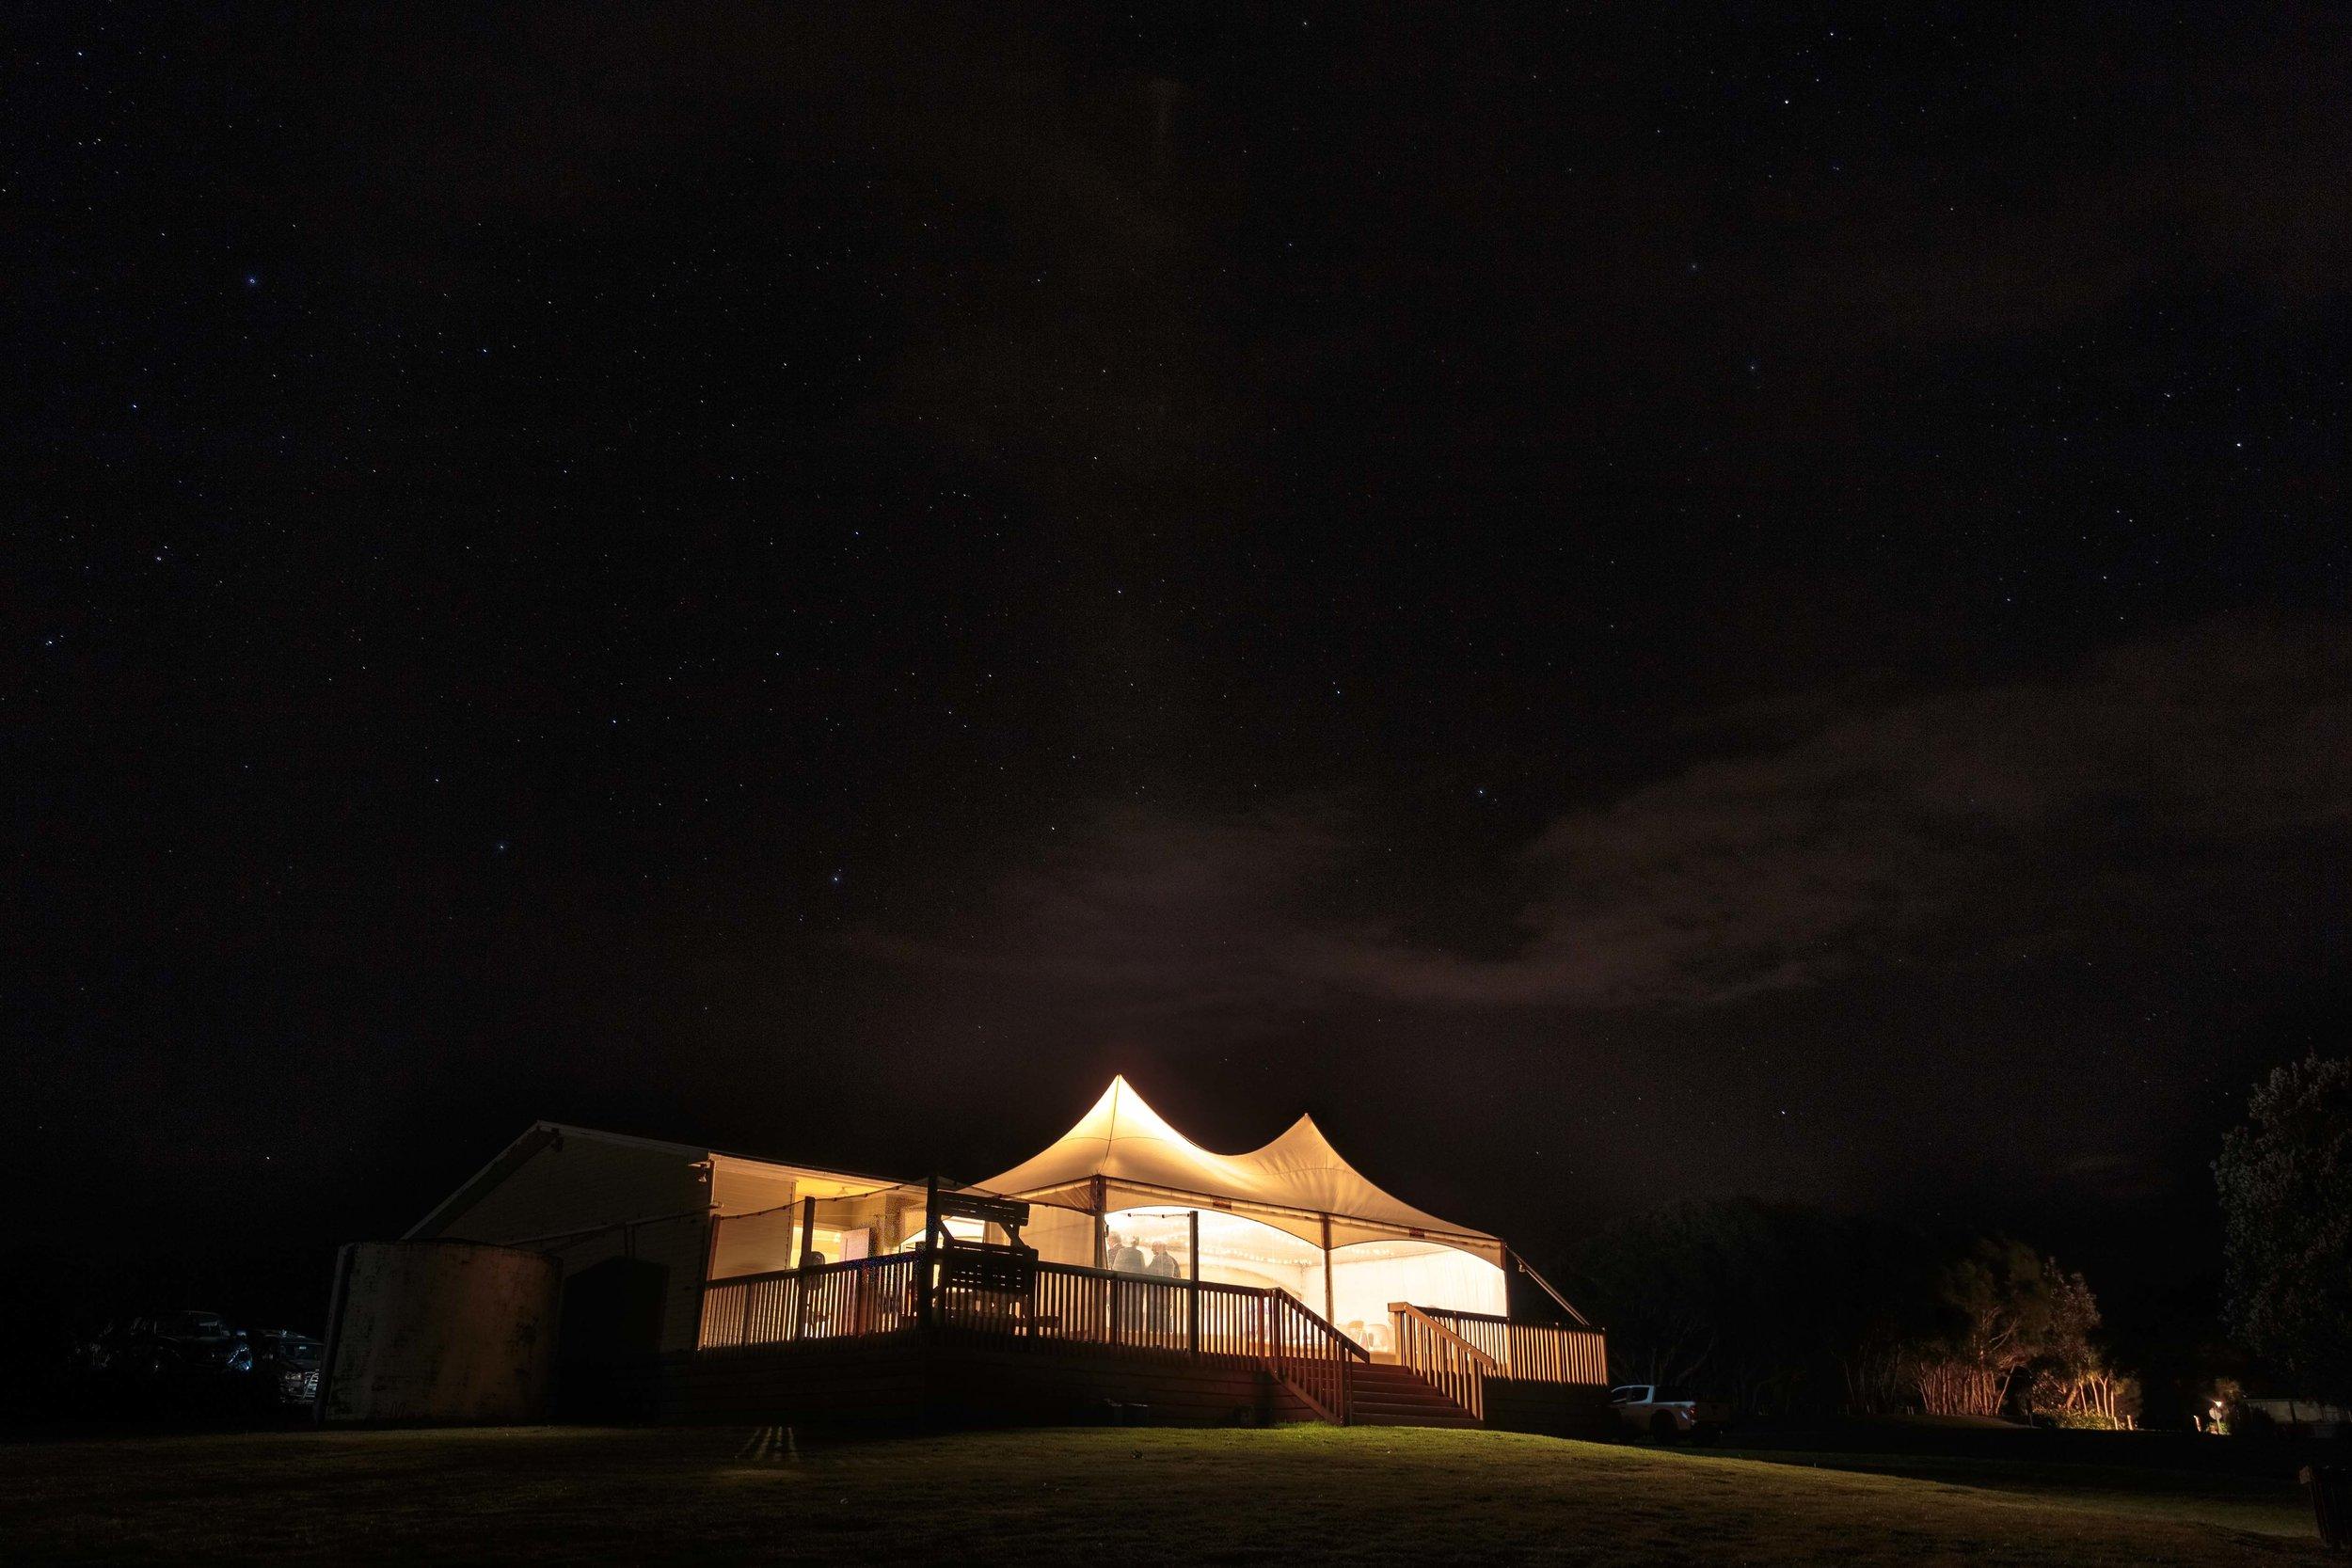 Highight-wedding-photography-dudding-lake-palmerston-north-new-zealand-93.jpg